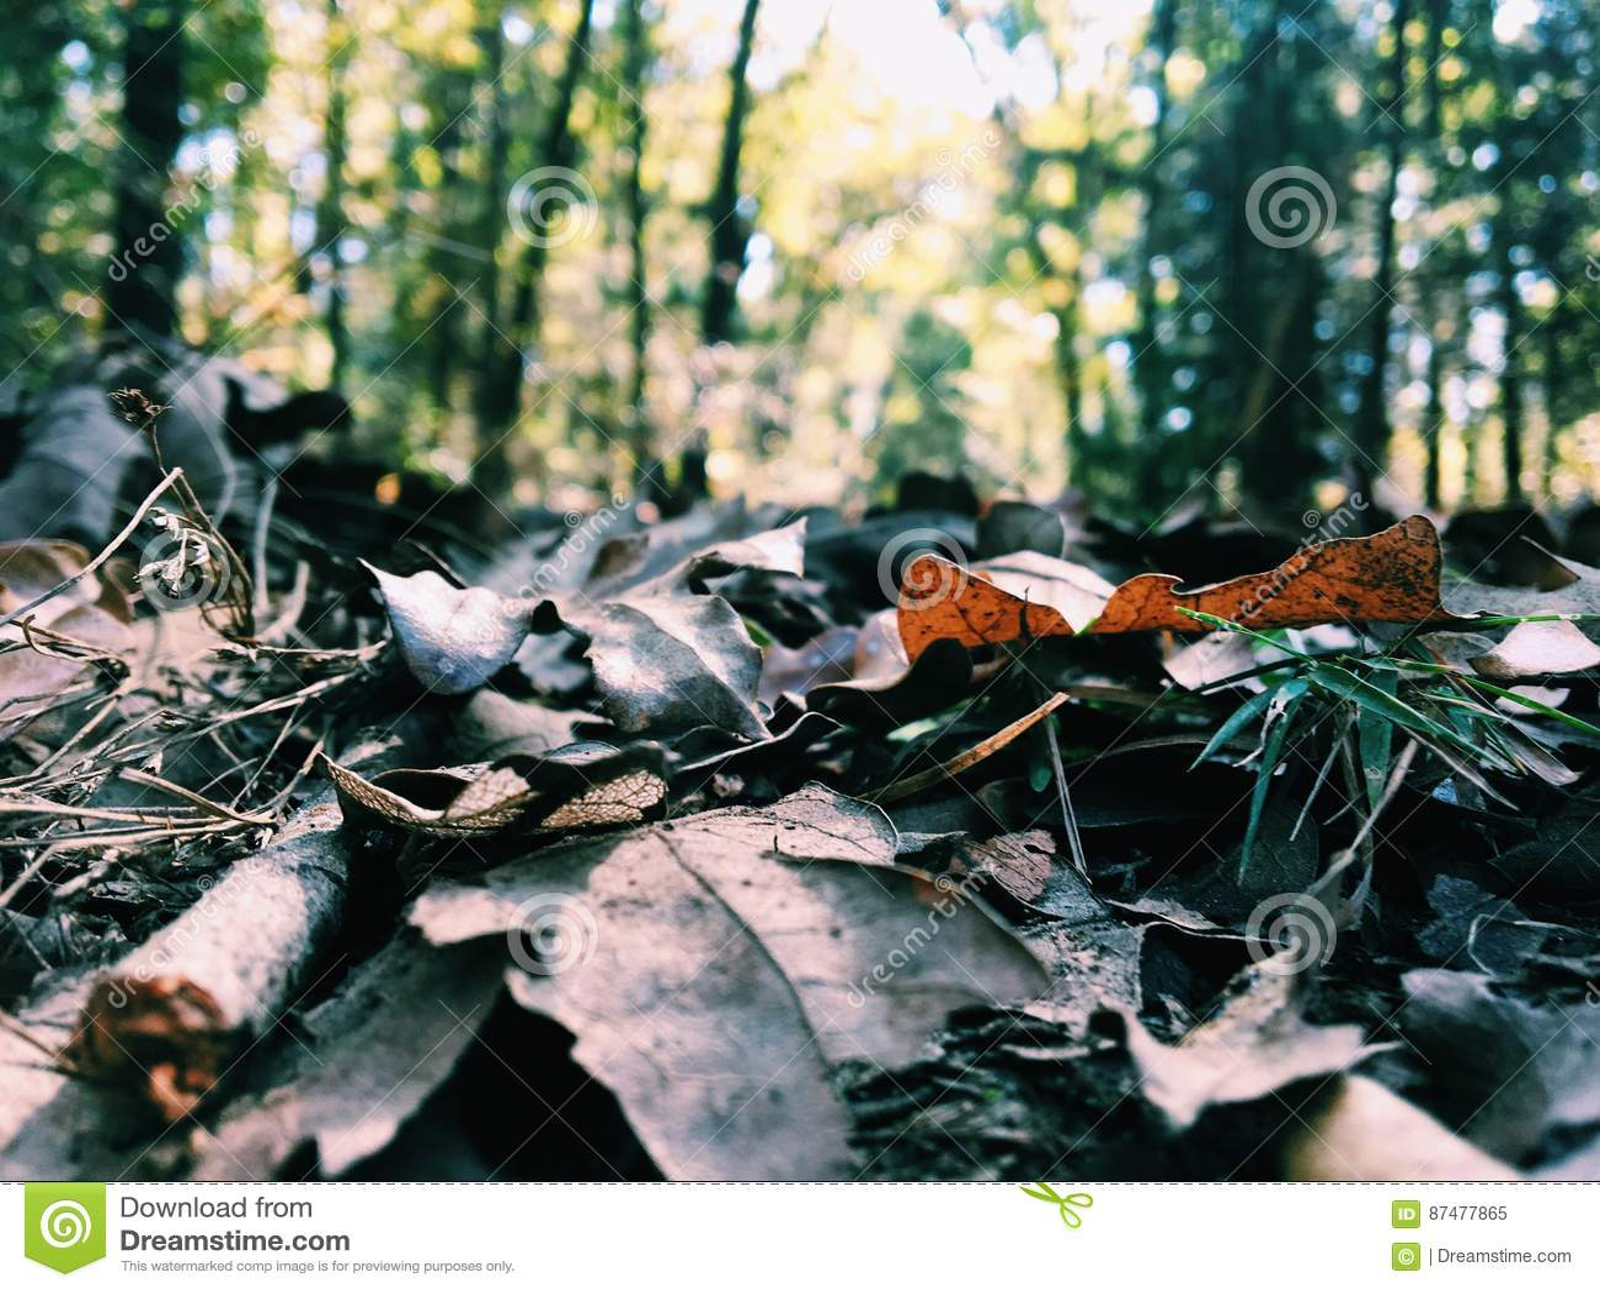 Leavess